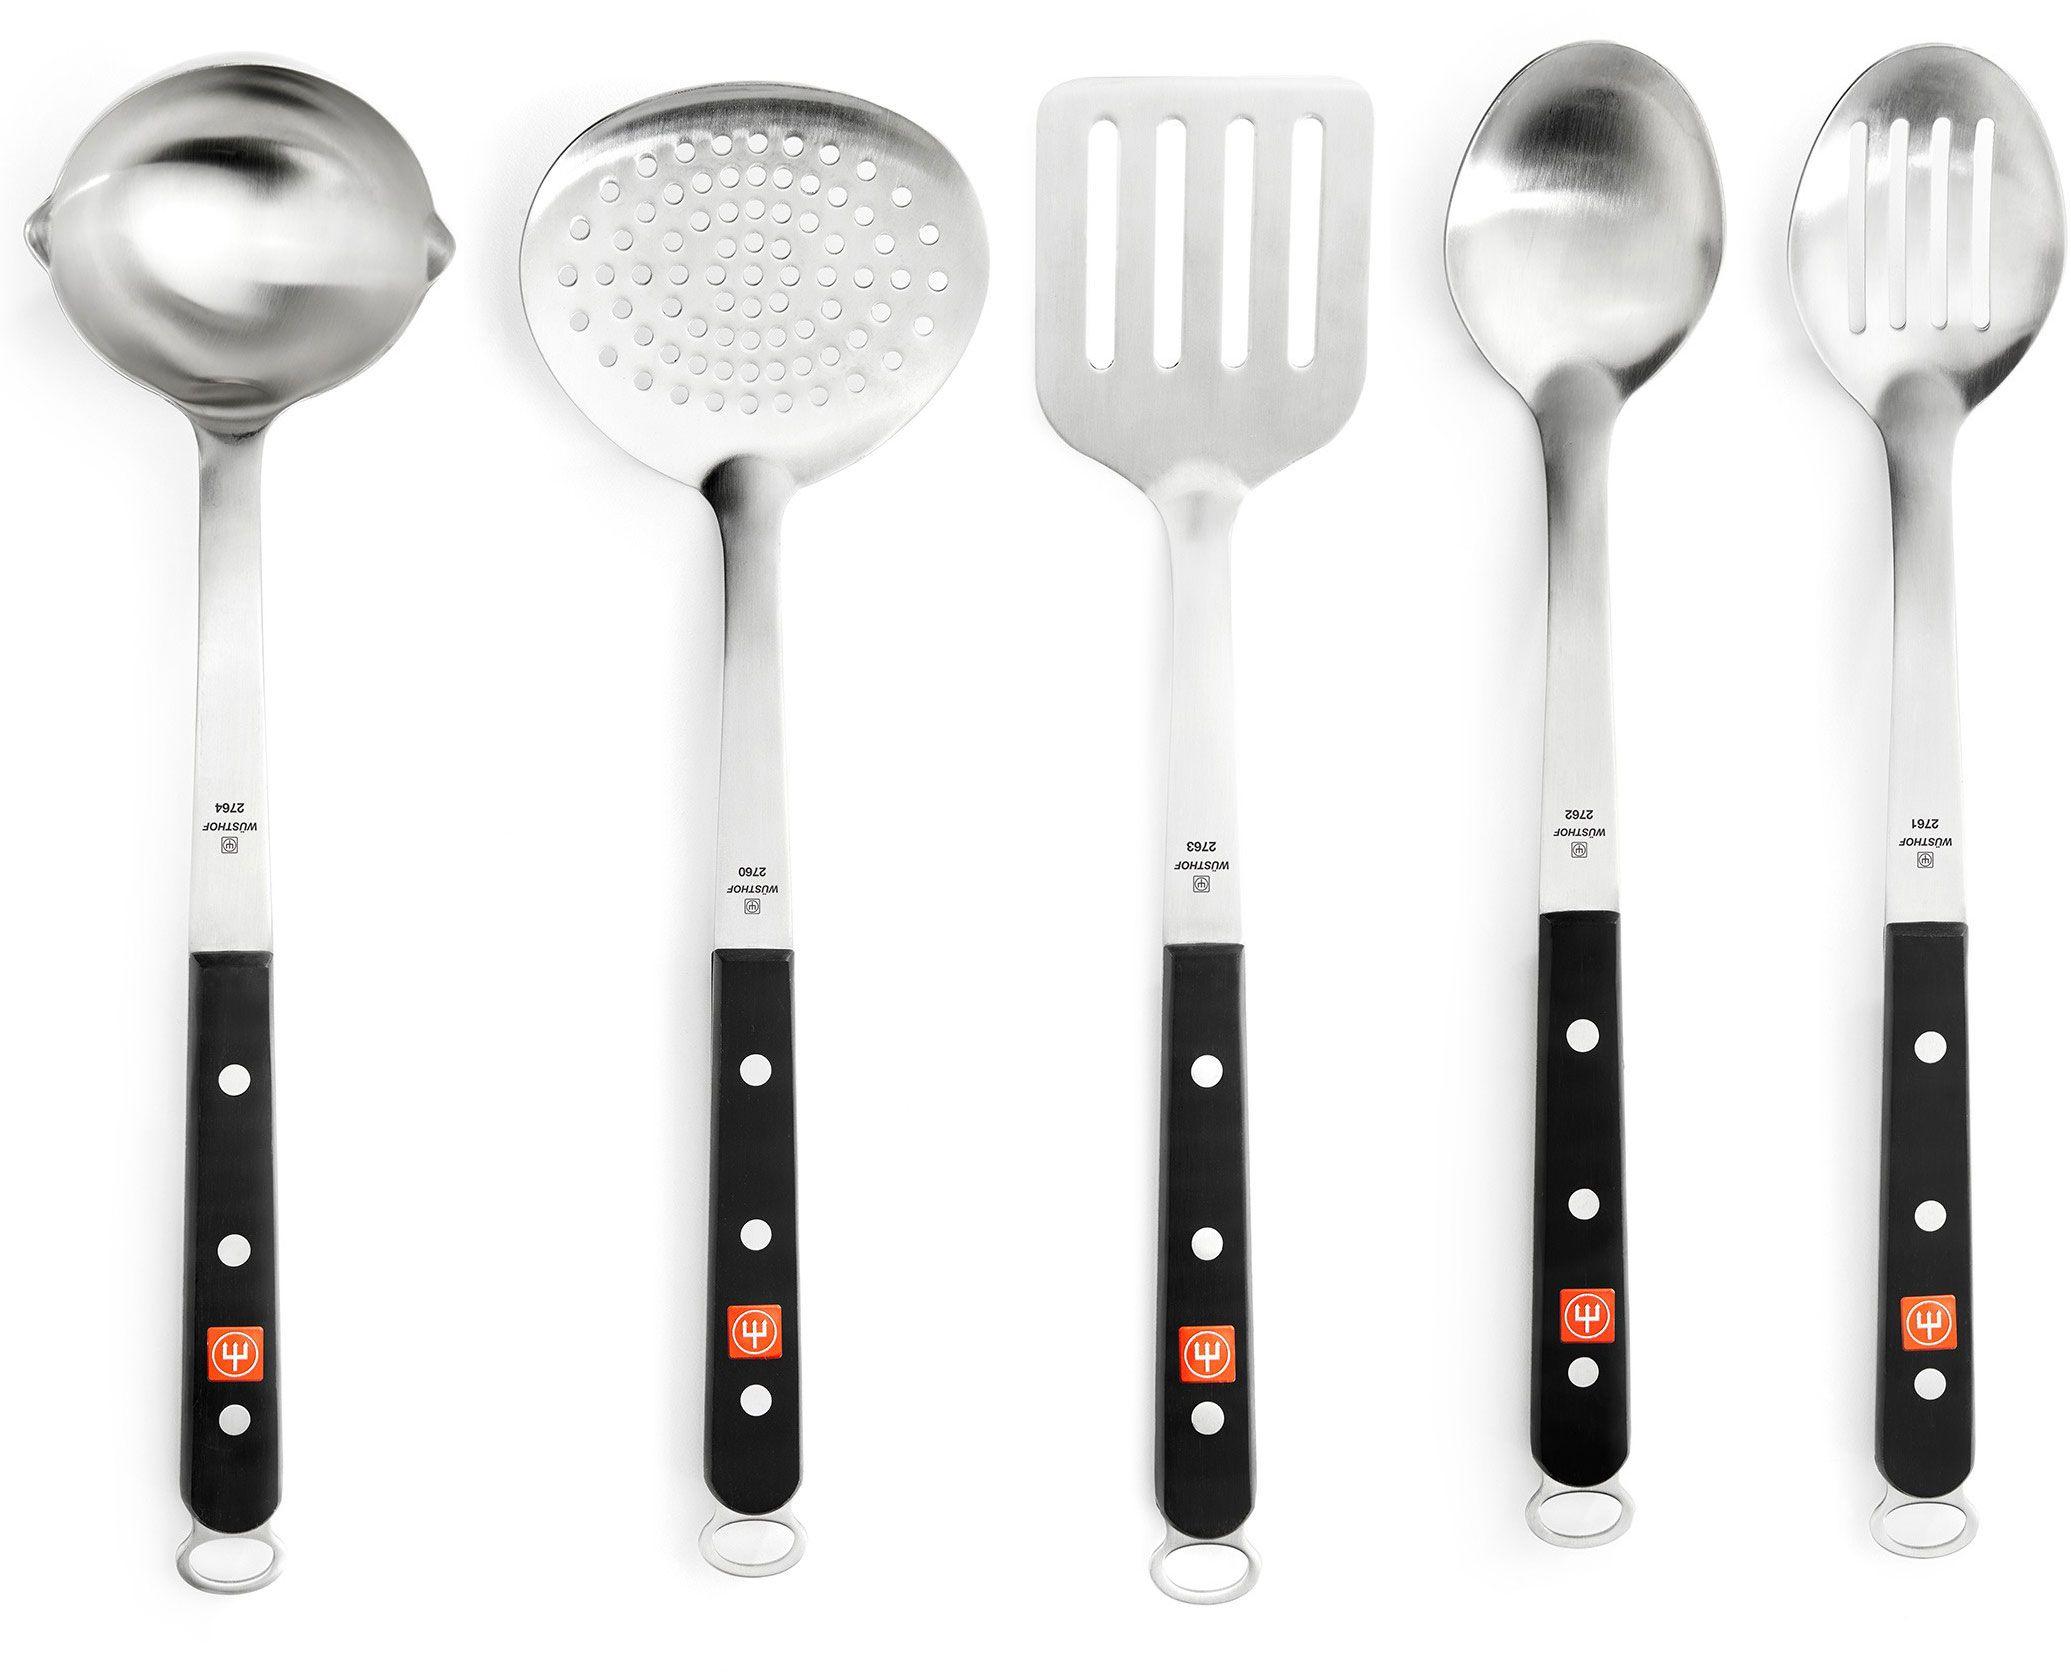 Wusthof 5 Piece Kitchen Tool/Utensil Set